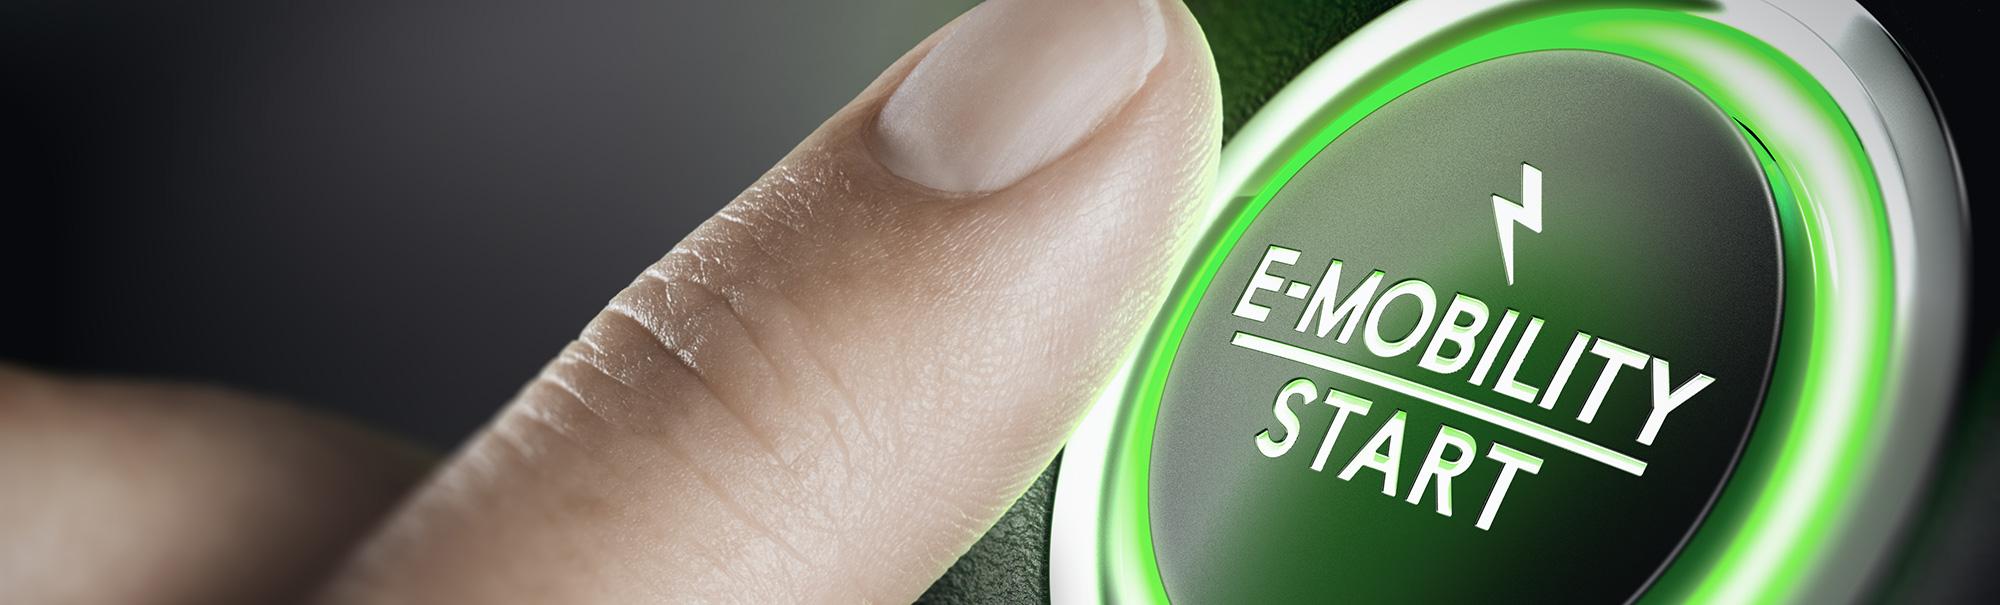 Energieberatung, Energieaudits & E-Mobilität